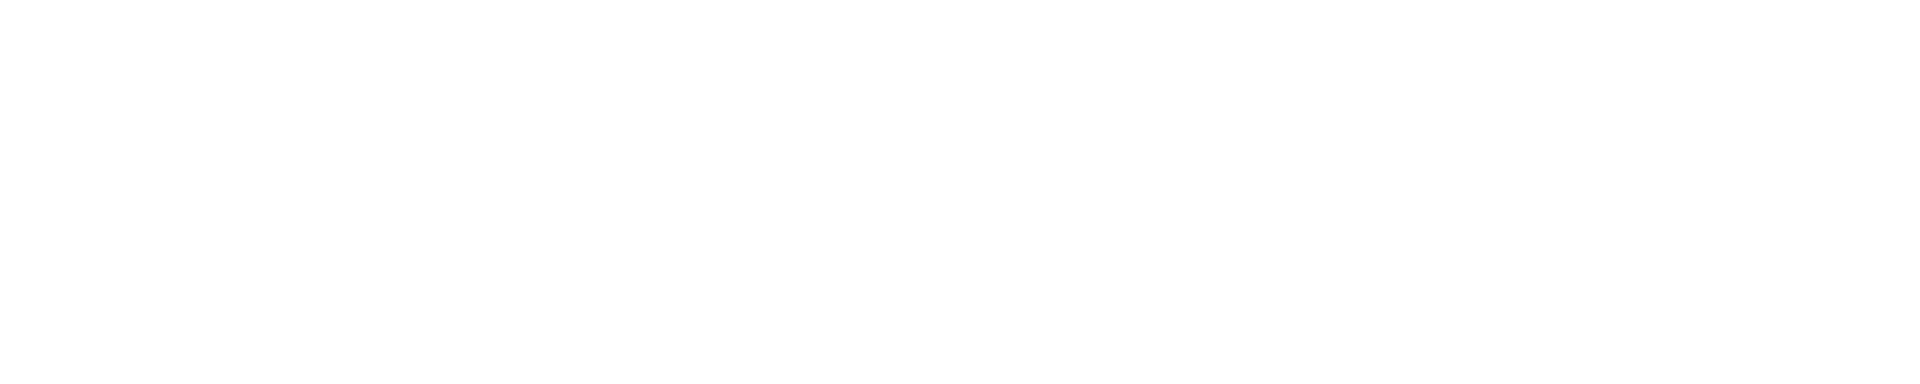 triangulo-blanco